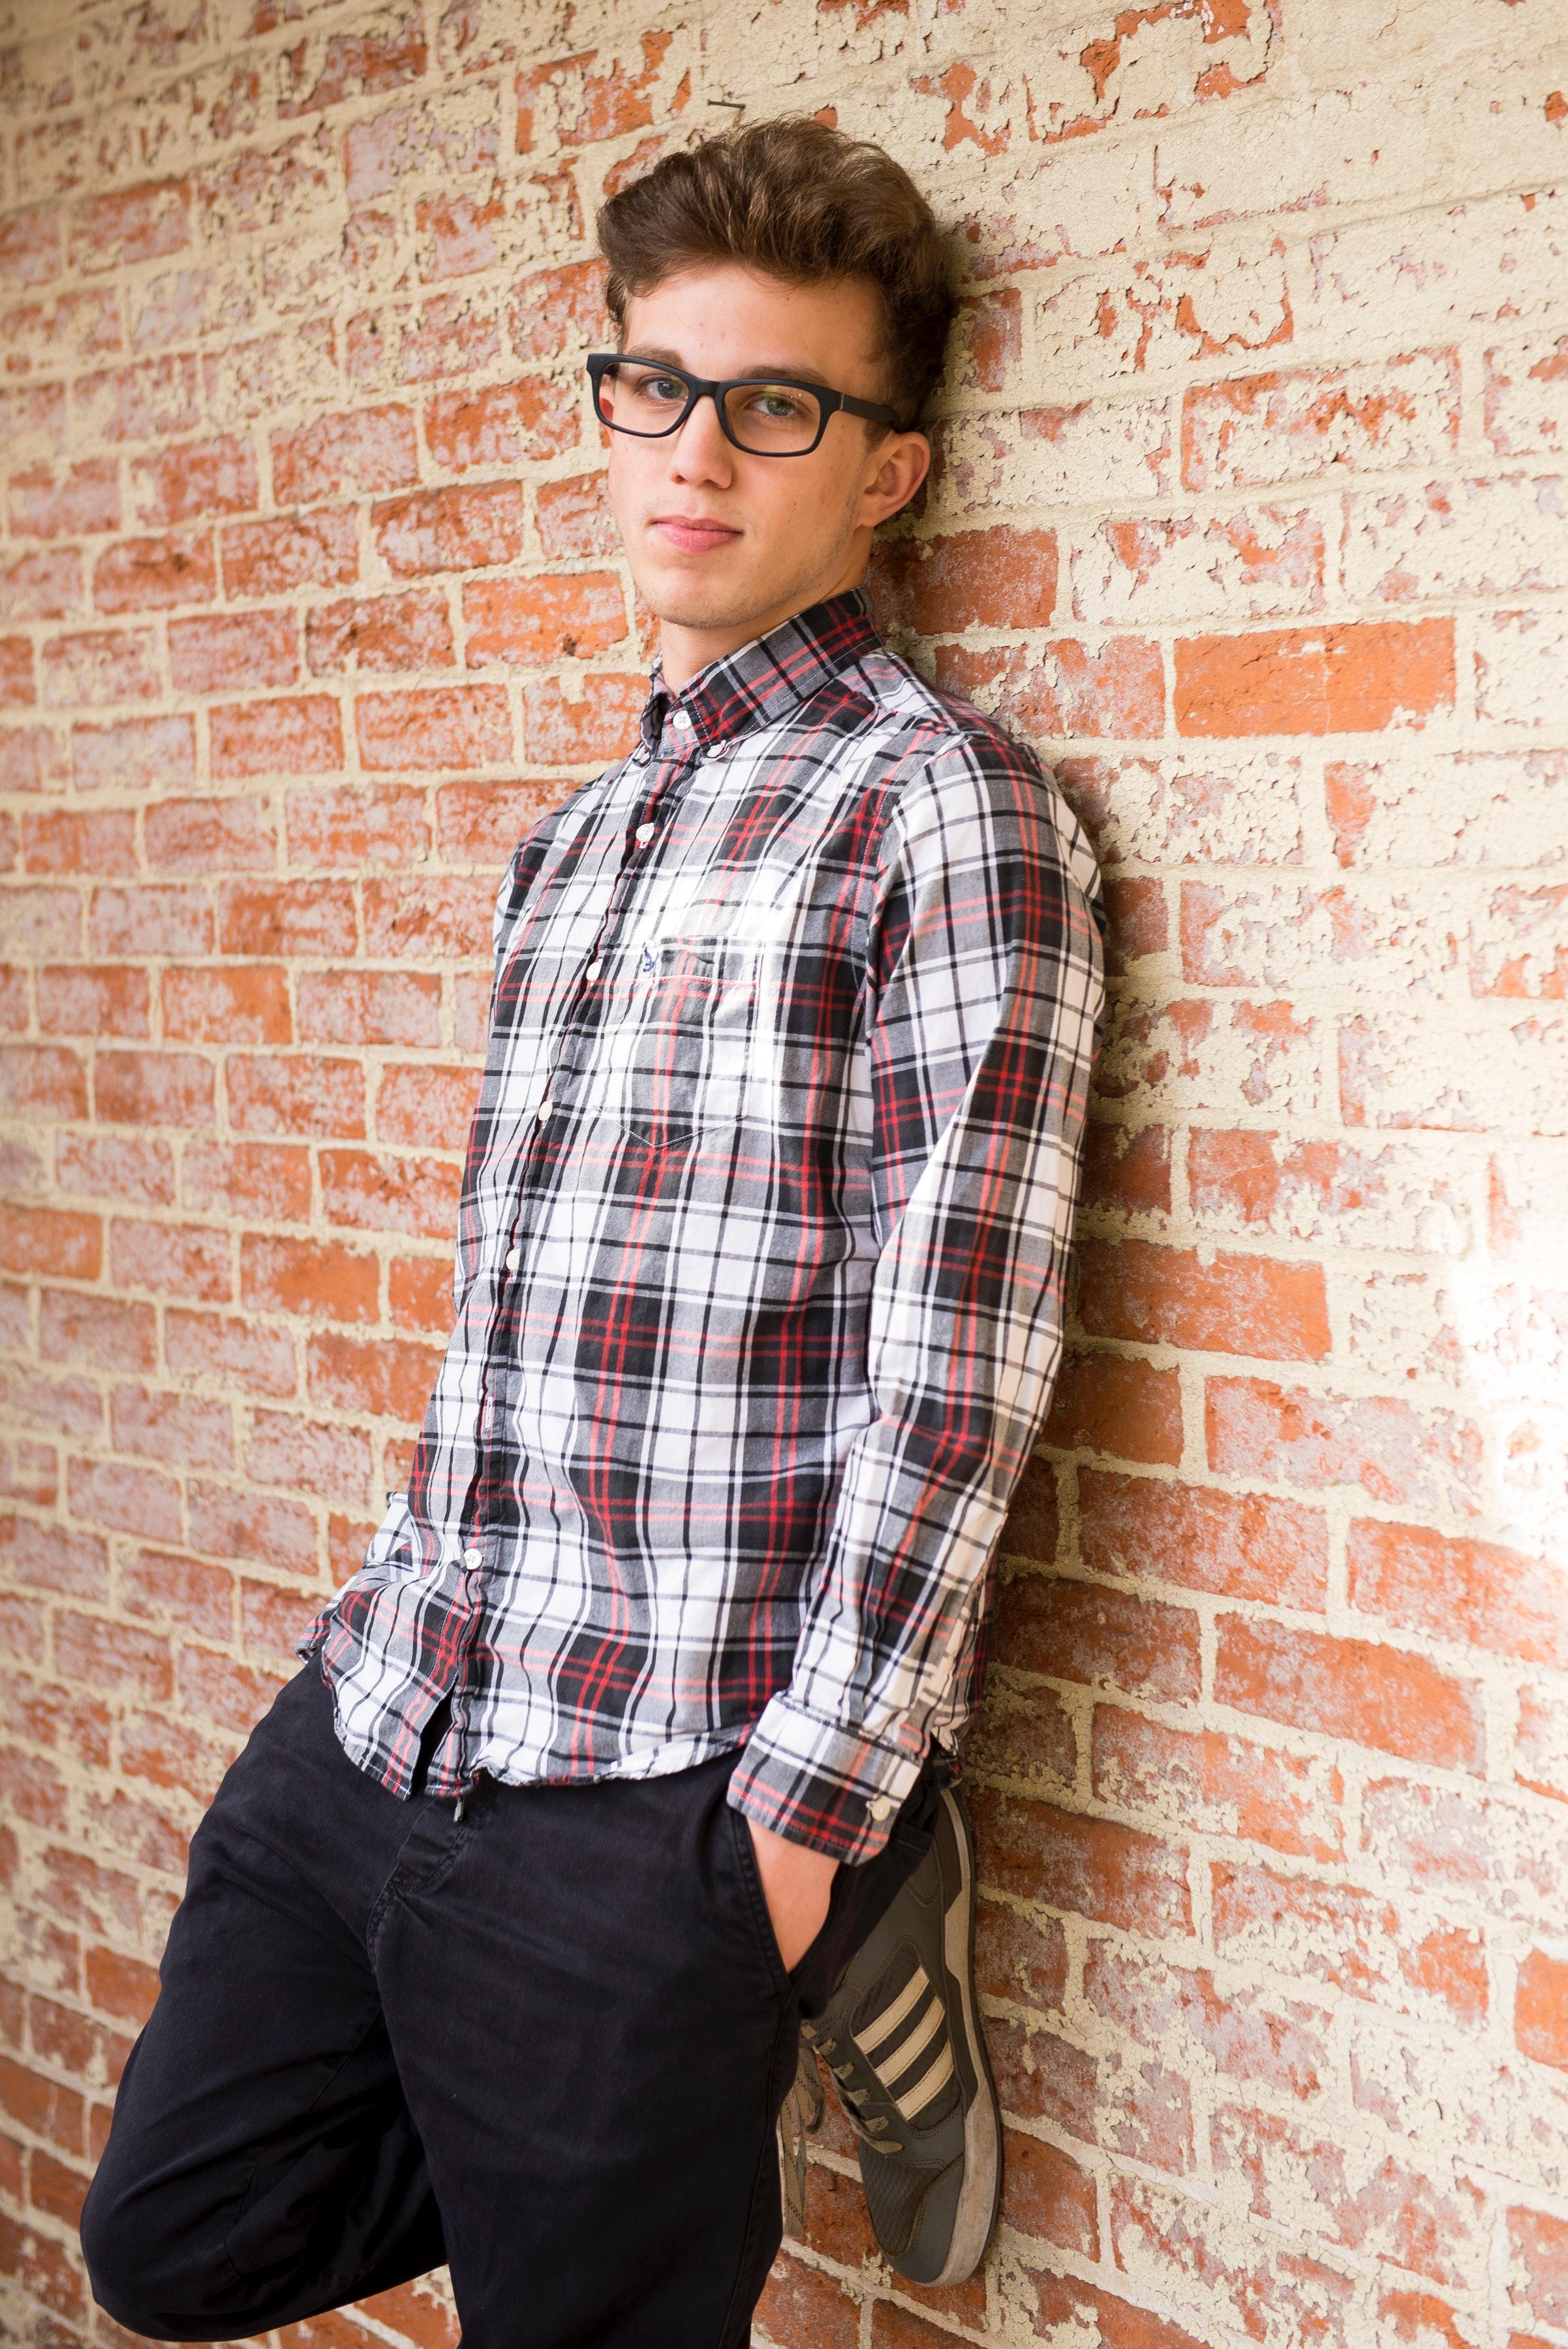 Man Wearing Plaid Dress Shirt And Black Pants, Brick wall, Shirt, Young, Wear, HQ Photo